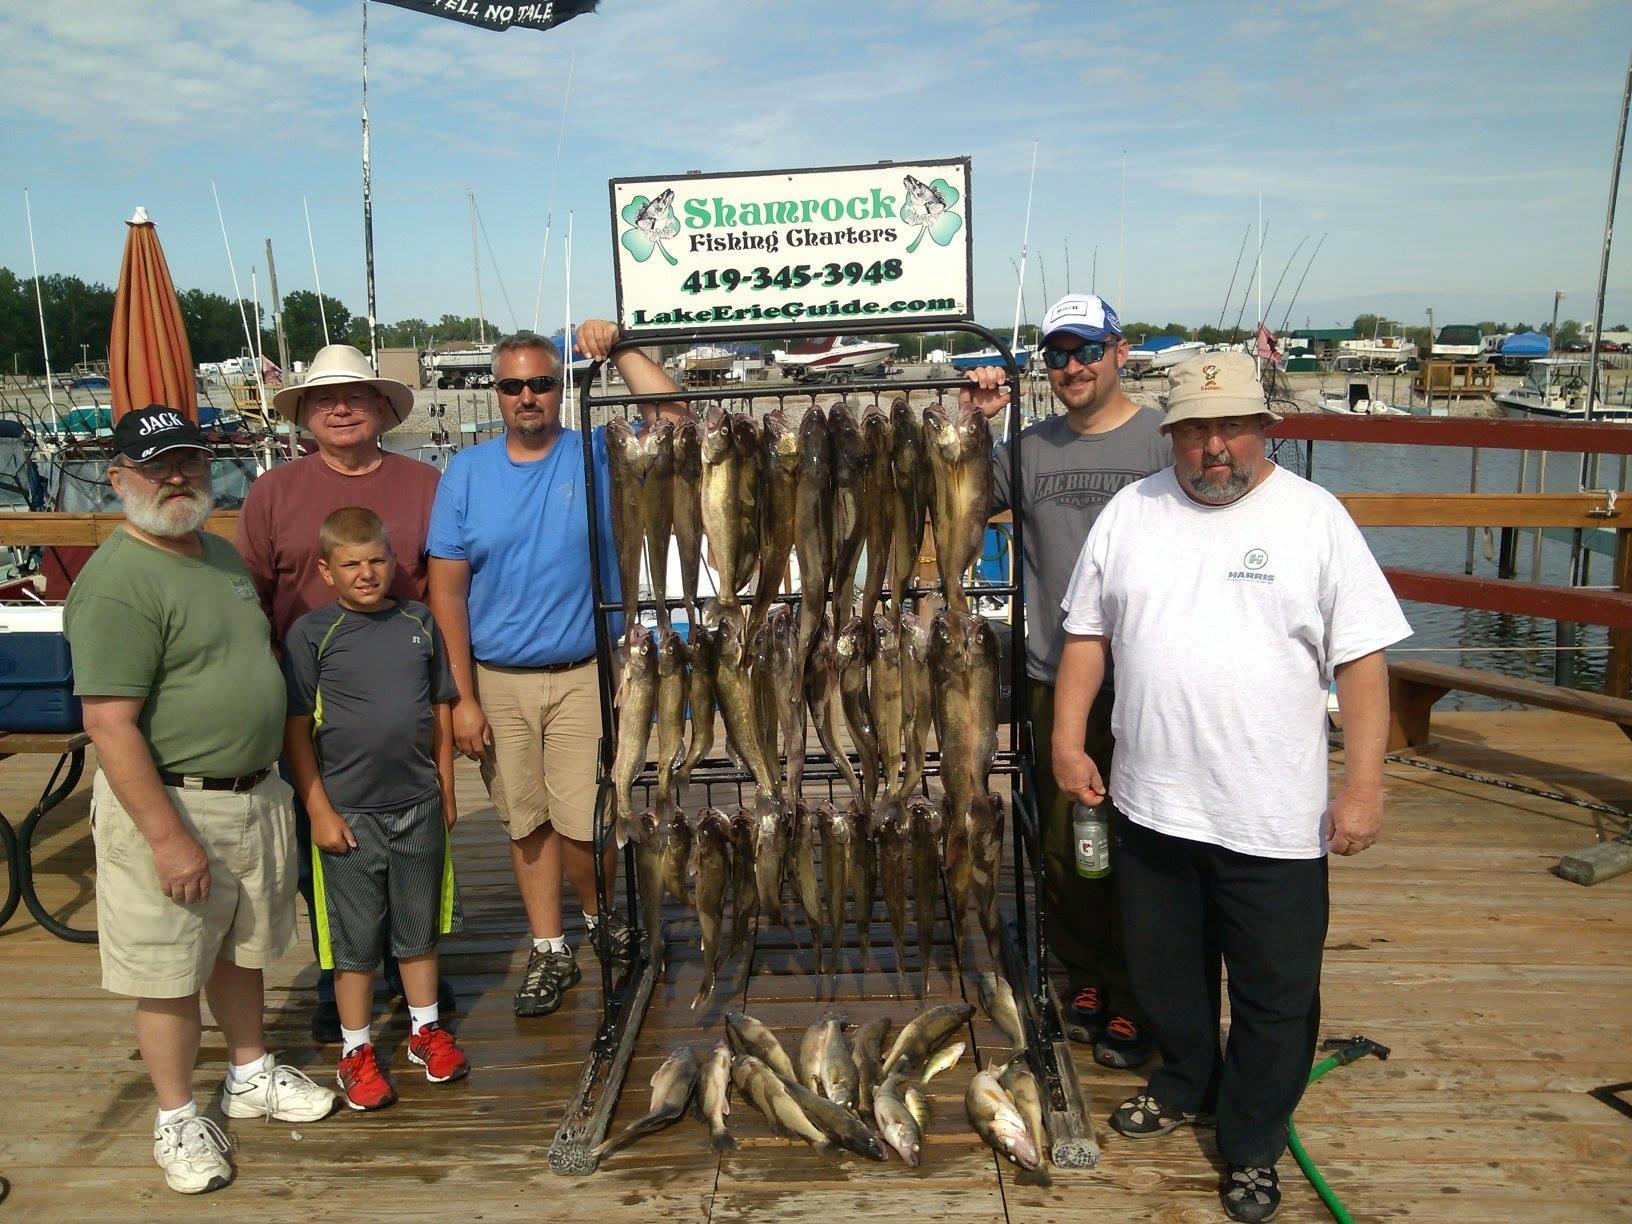 Shamrock fishing charters coupons near me in curtice for Fishing charters near me